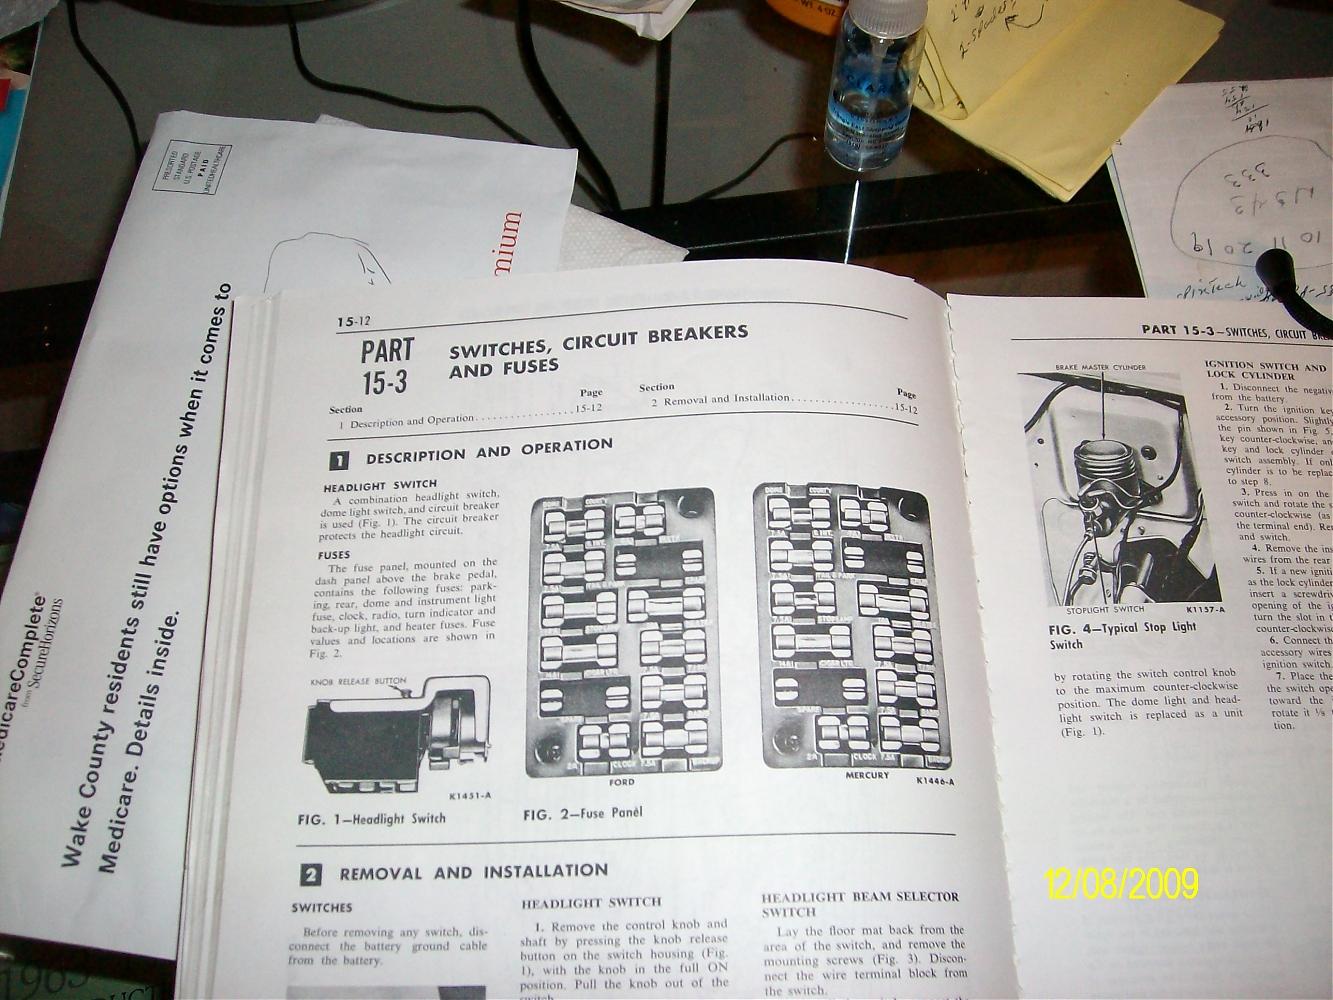 2004 mustang fuse box layout